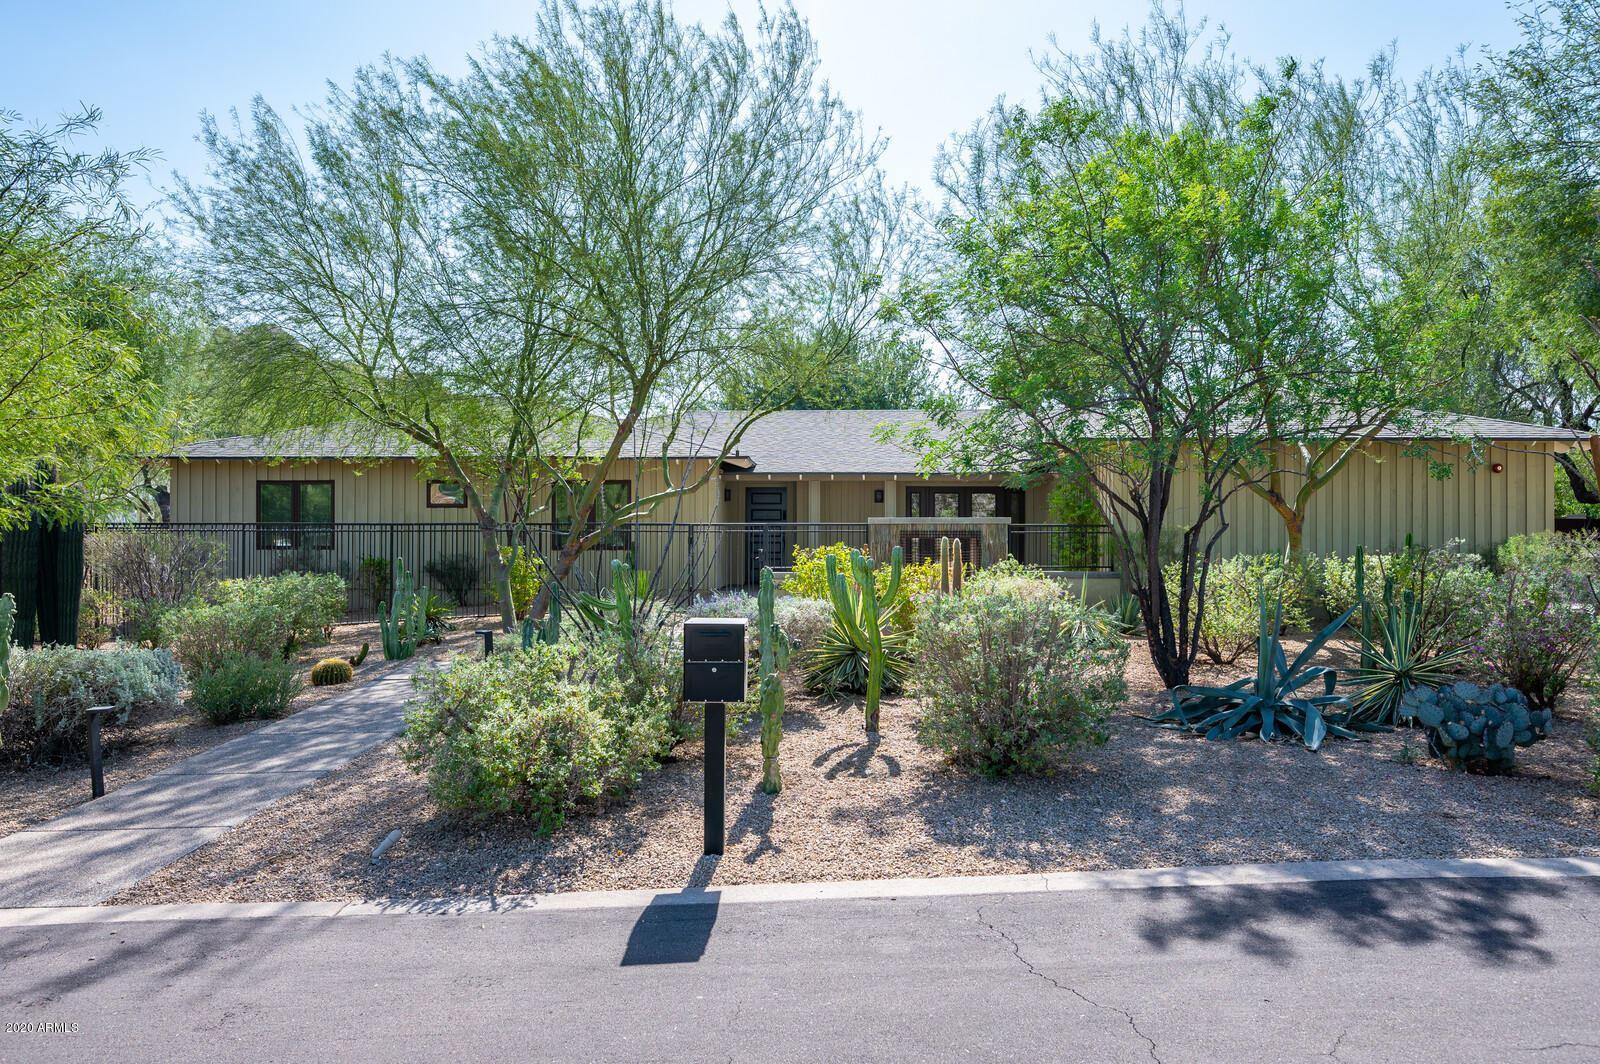 5625 E LEWIS Avenue, Scottsdale, AZ 85257 - MLS#: 6078939